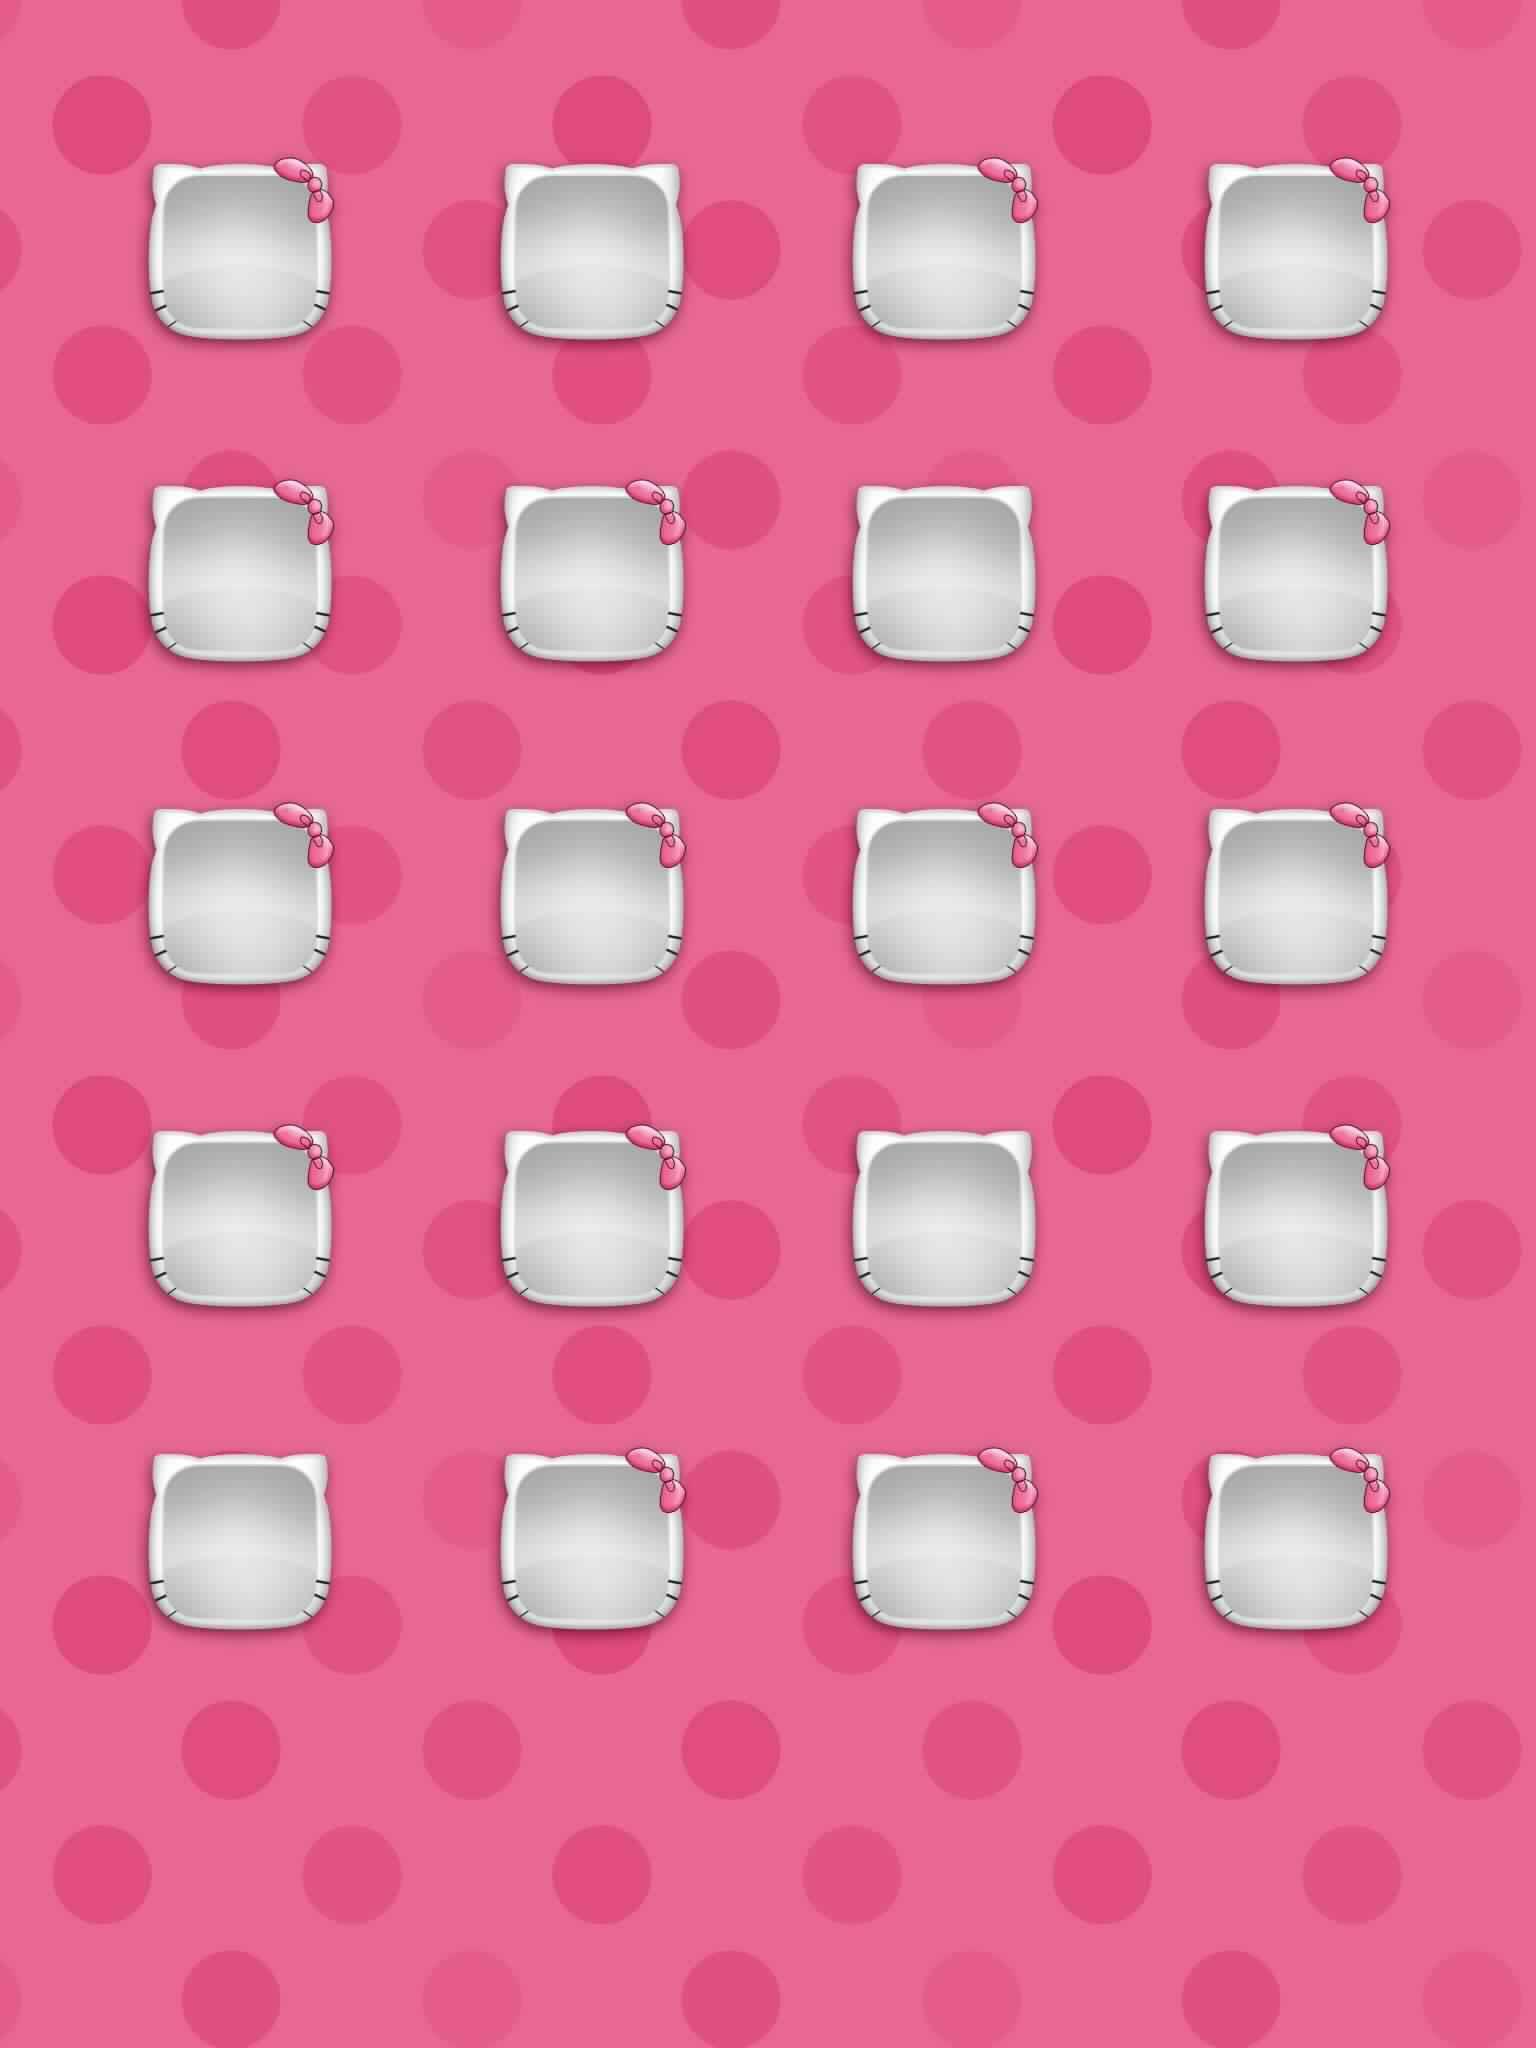 Iphone icon wallpaper tumblr - App Icon Skin Wallpaper